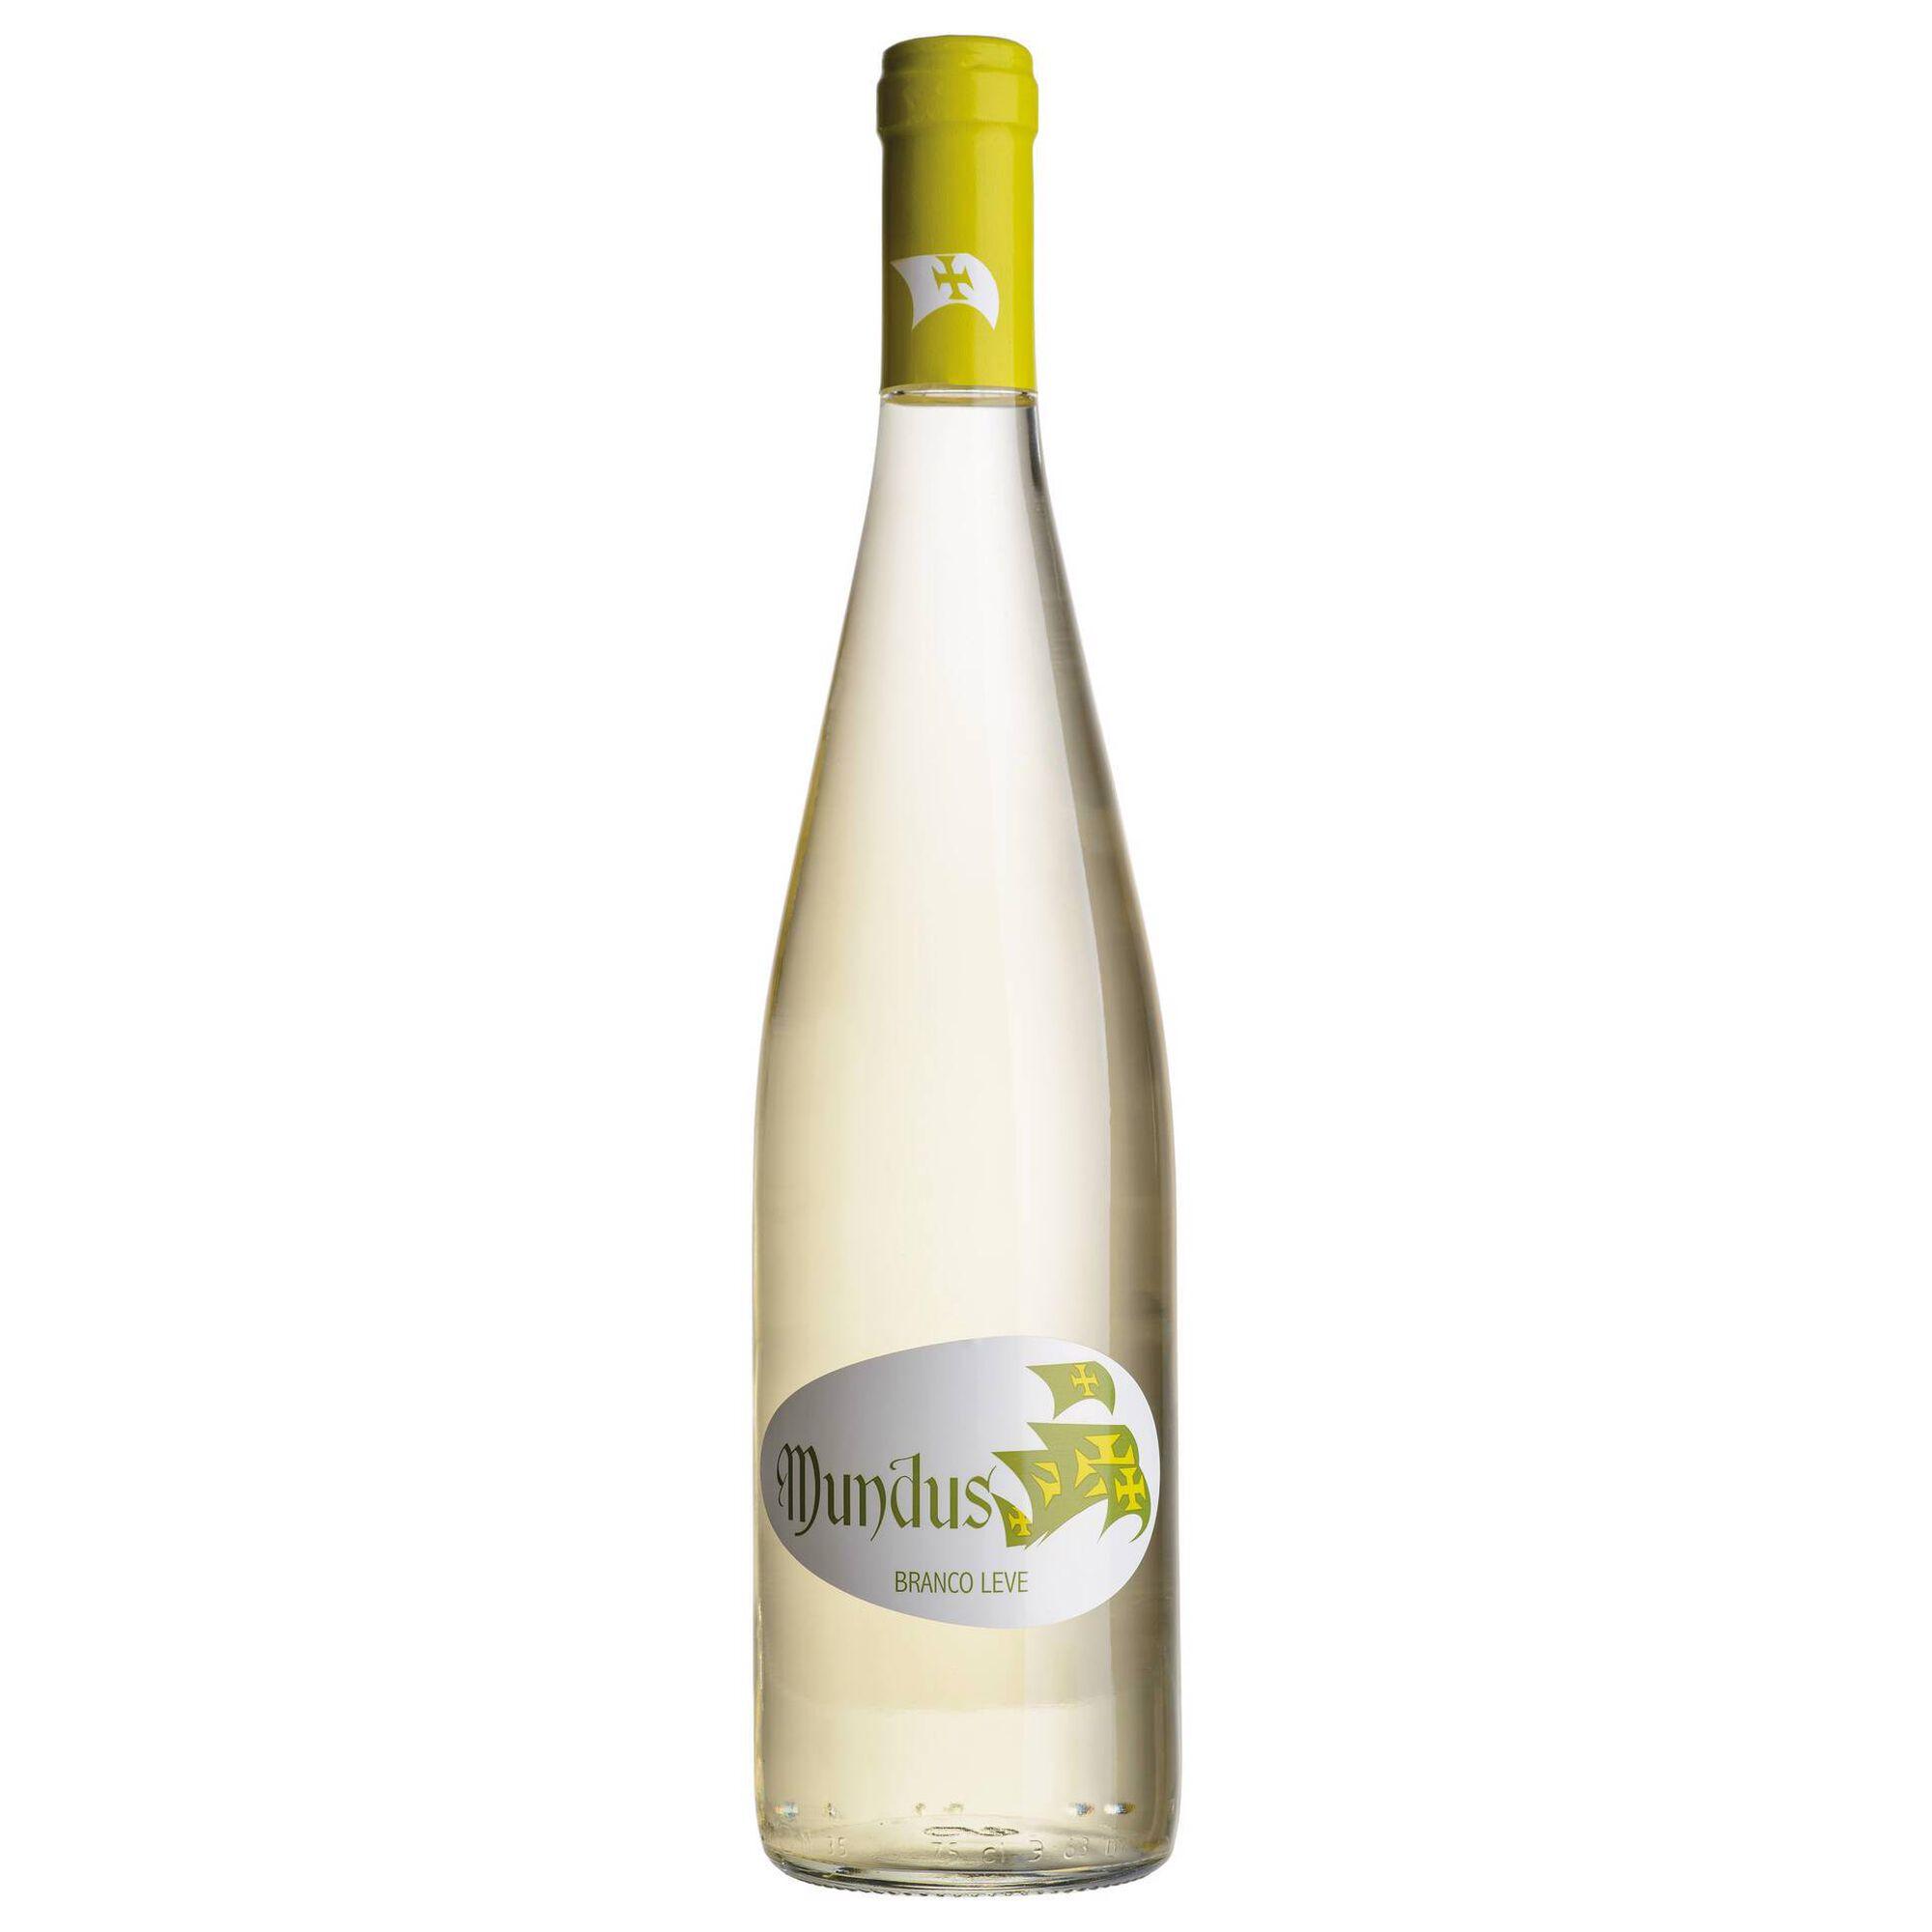 Mundus Leve Regional Lisboa Vinho Branco